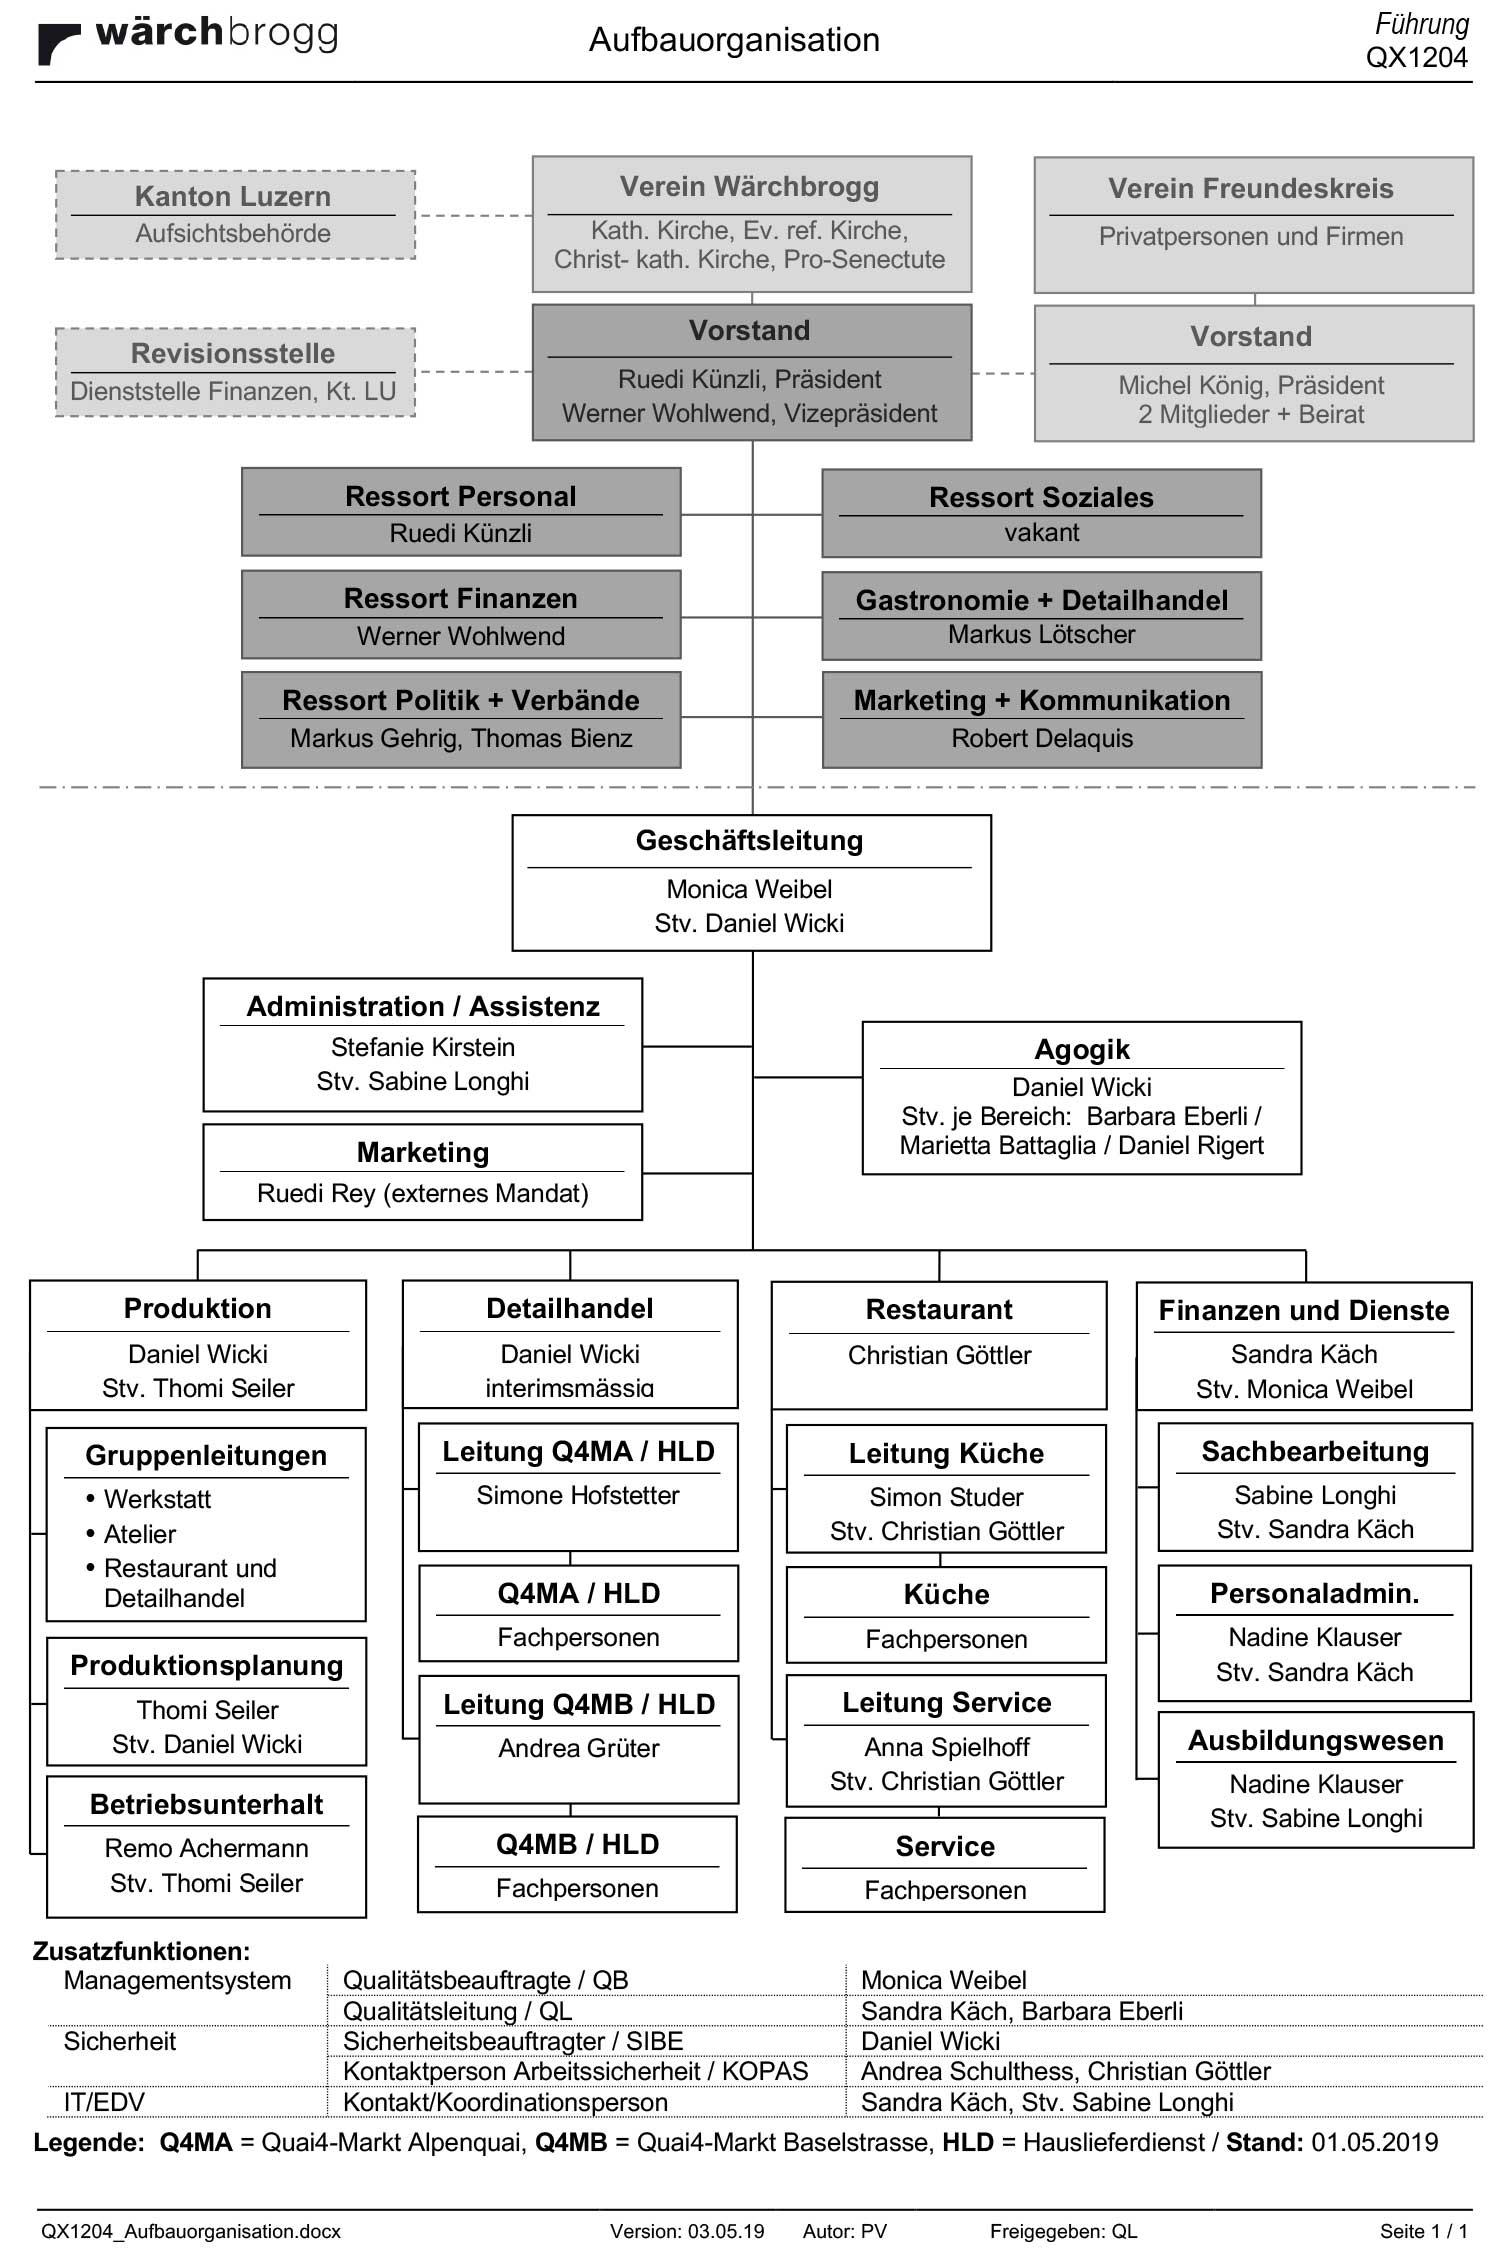 QX1204 Aufbauorganisation